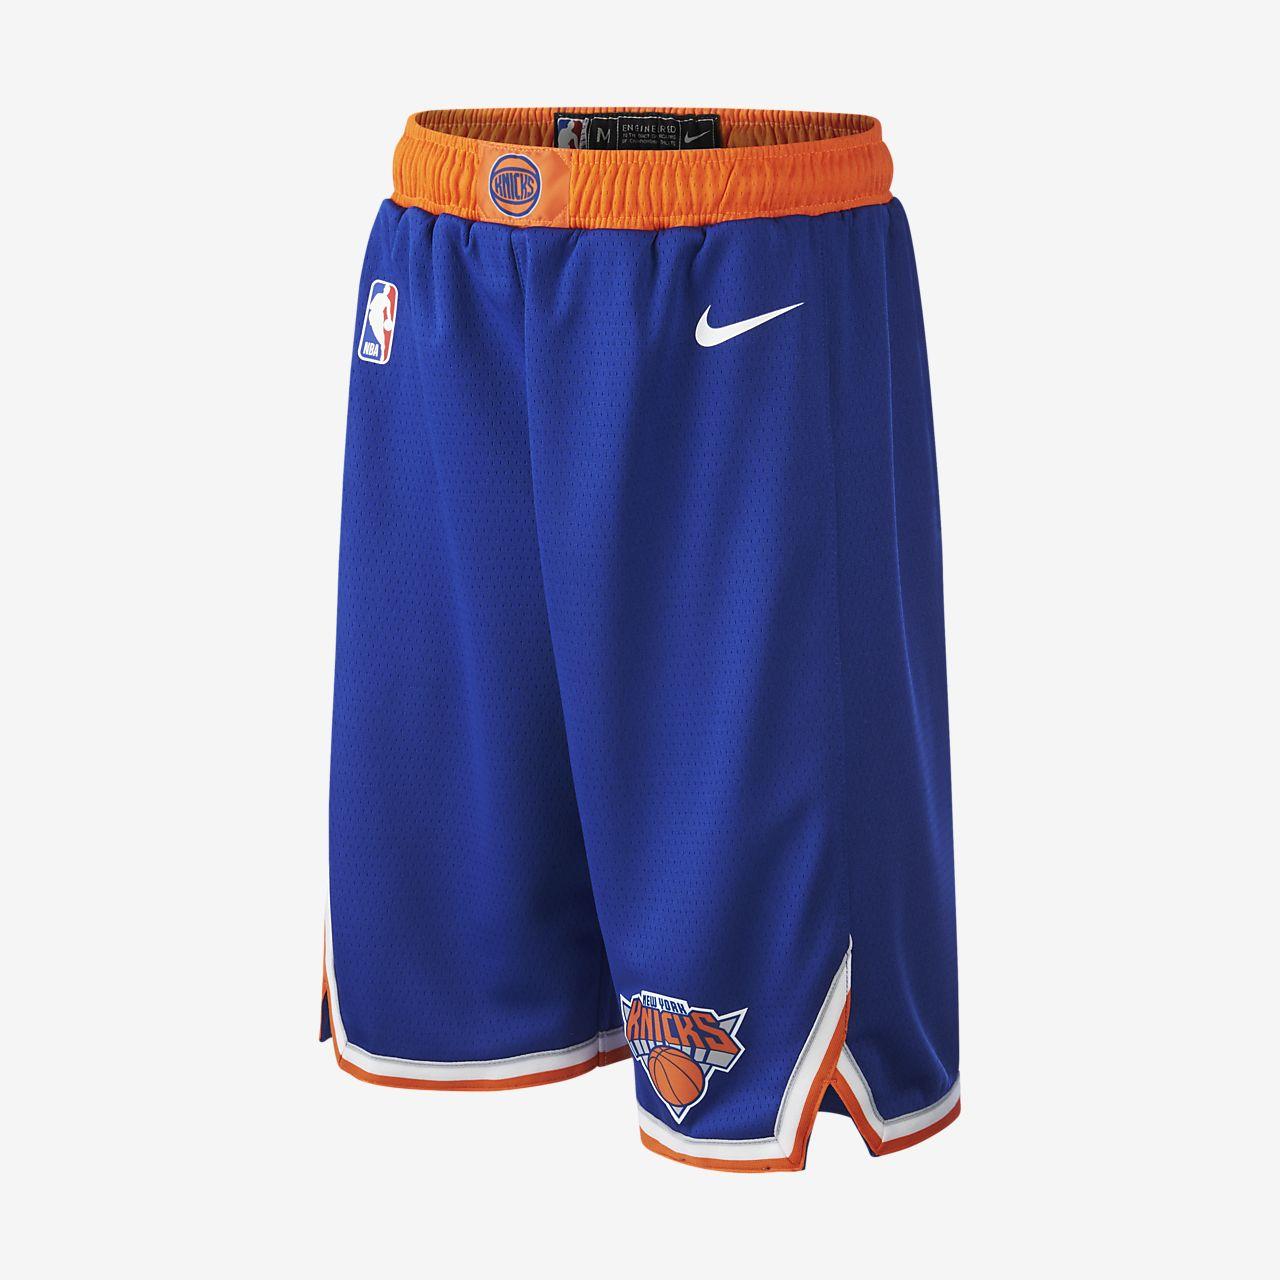 Short NBA New York Knicks Icon Edition Swingman Nike pour Enfant plus âgé